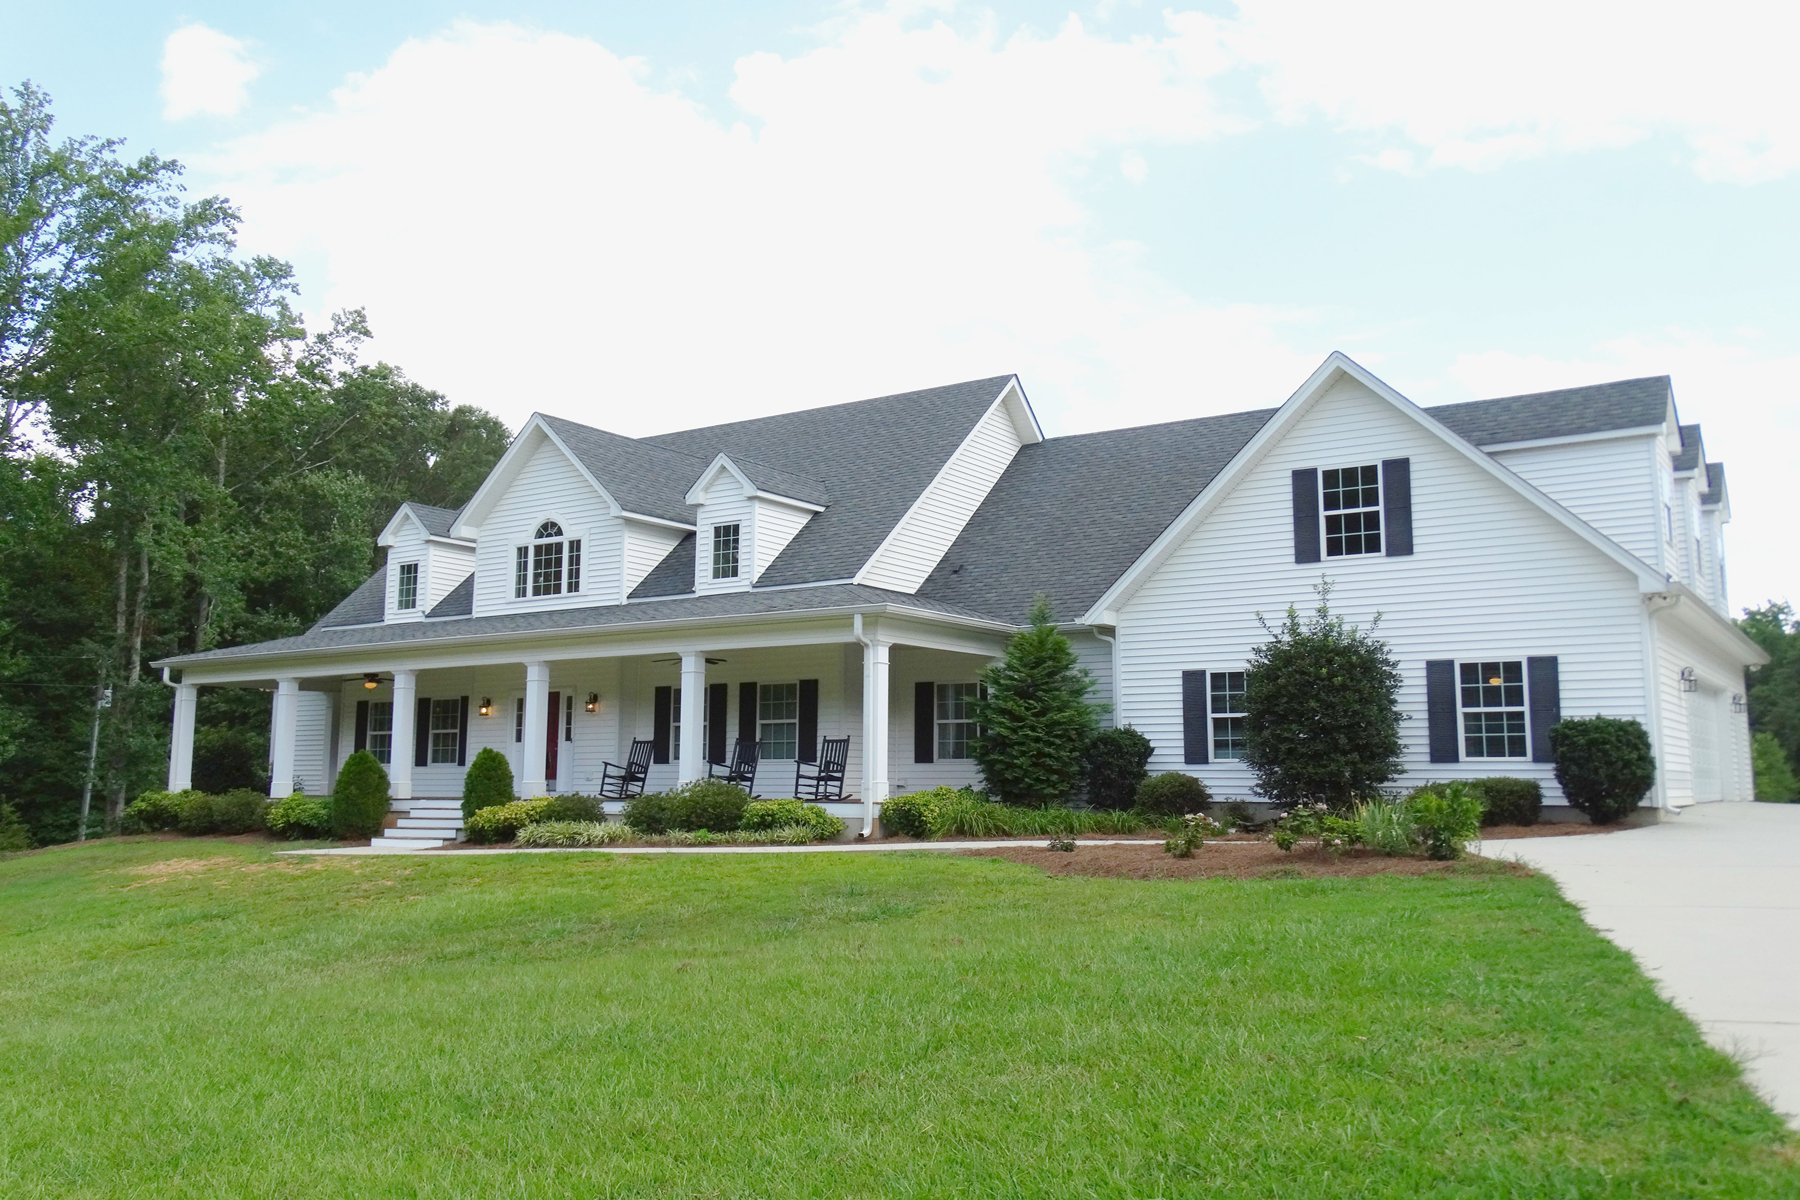 Single Family Home for Sale at Elegant Farmhouse Style Living 521 Christopher Road Sharpsburg, Georgia, 30277 United States